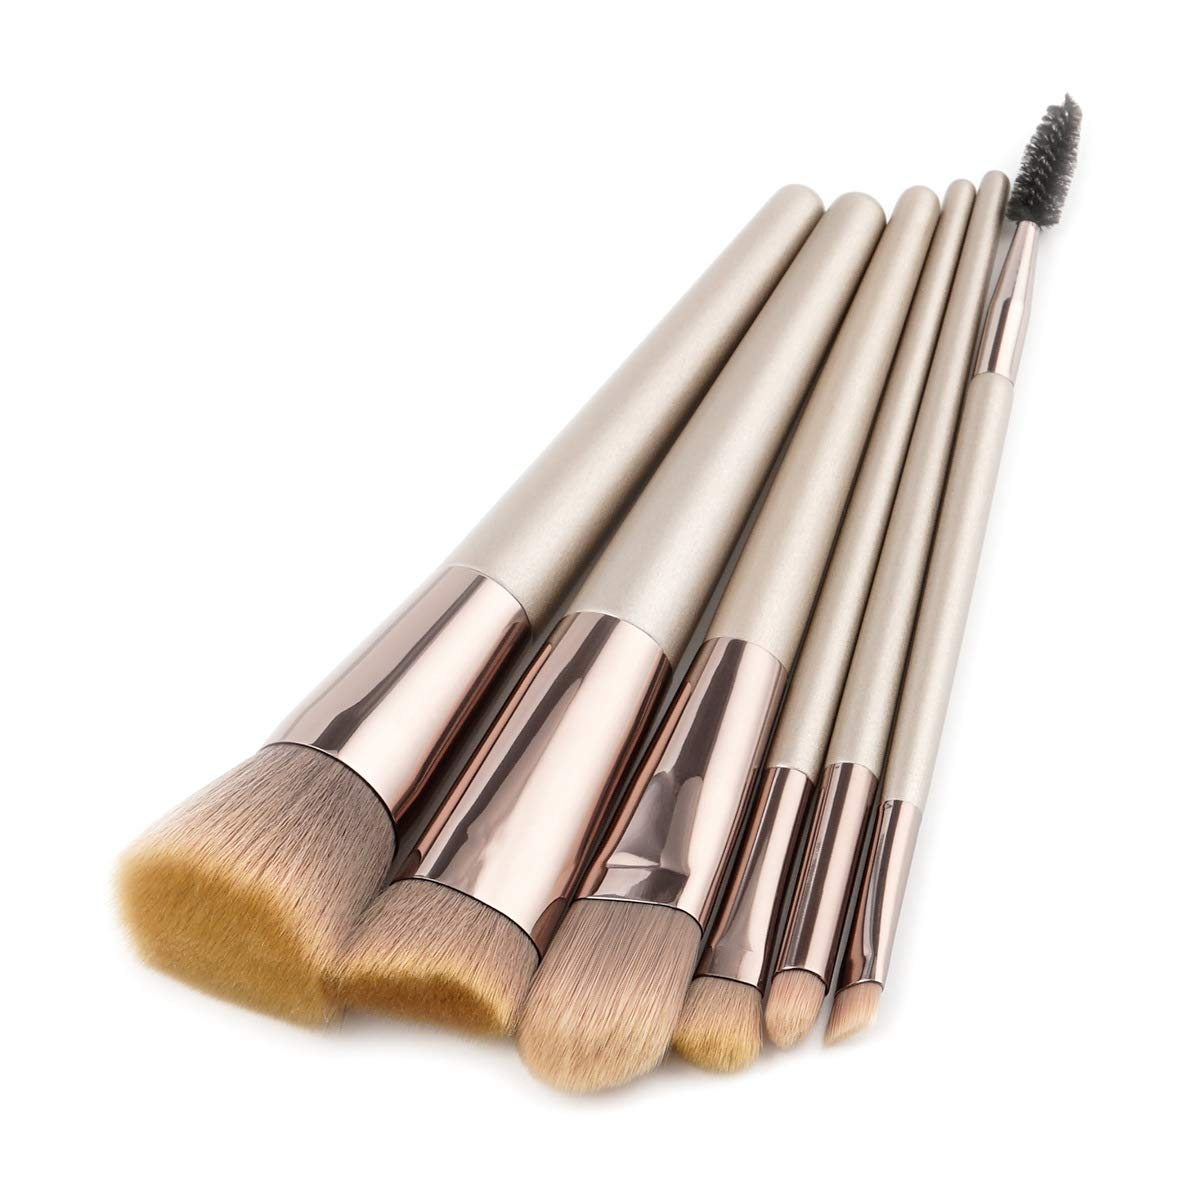 BBL 6pcs Luxury Champagne Gold Makeup Brushes Set, Premium Synthetic Foundation Blending Powder Eye Shadow Concealer Contour Face Kabuki Make Up Brushes cosmetics applicator (Champagne 6pcs yellow)